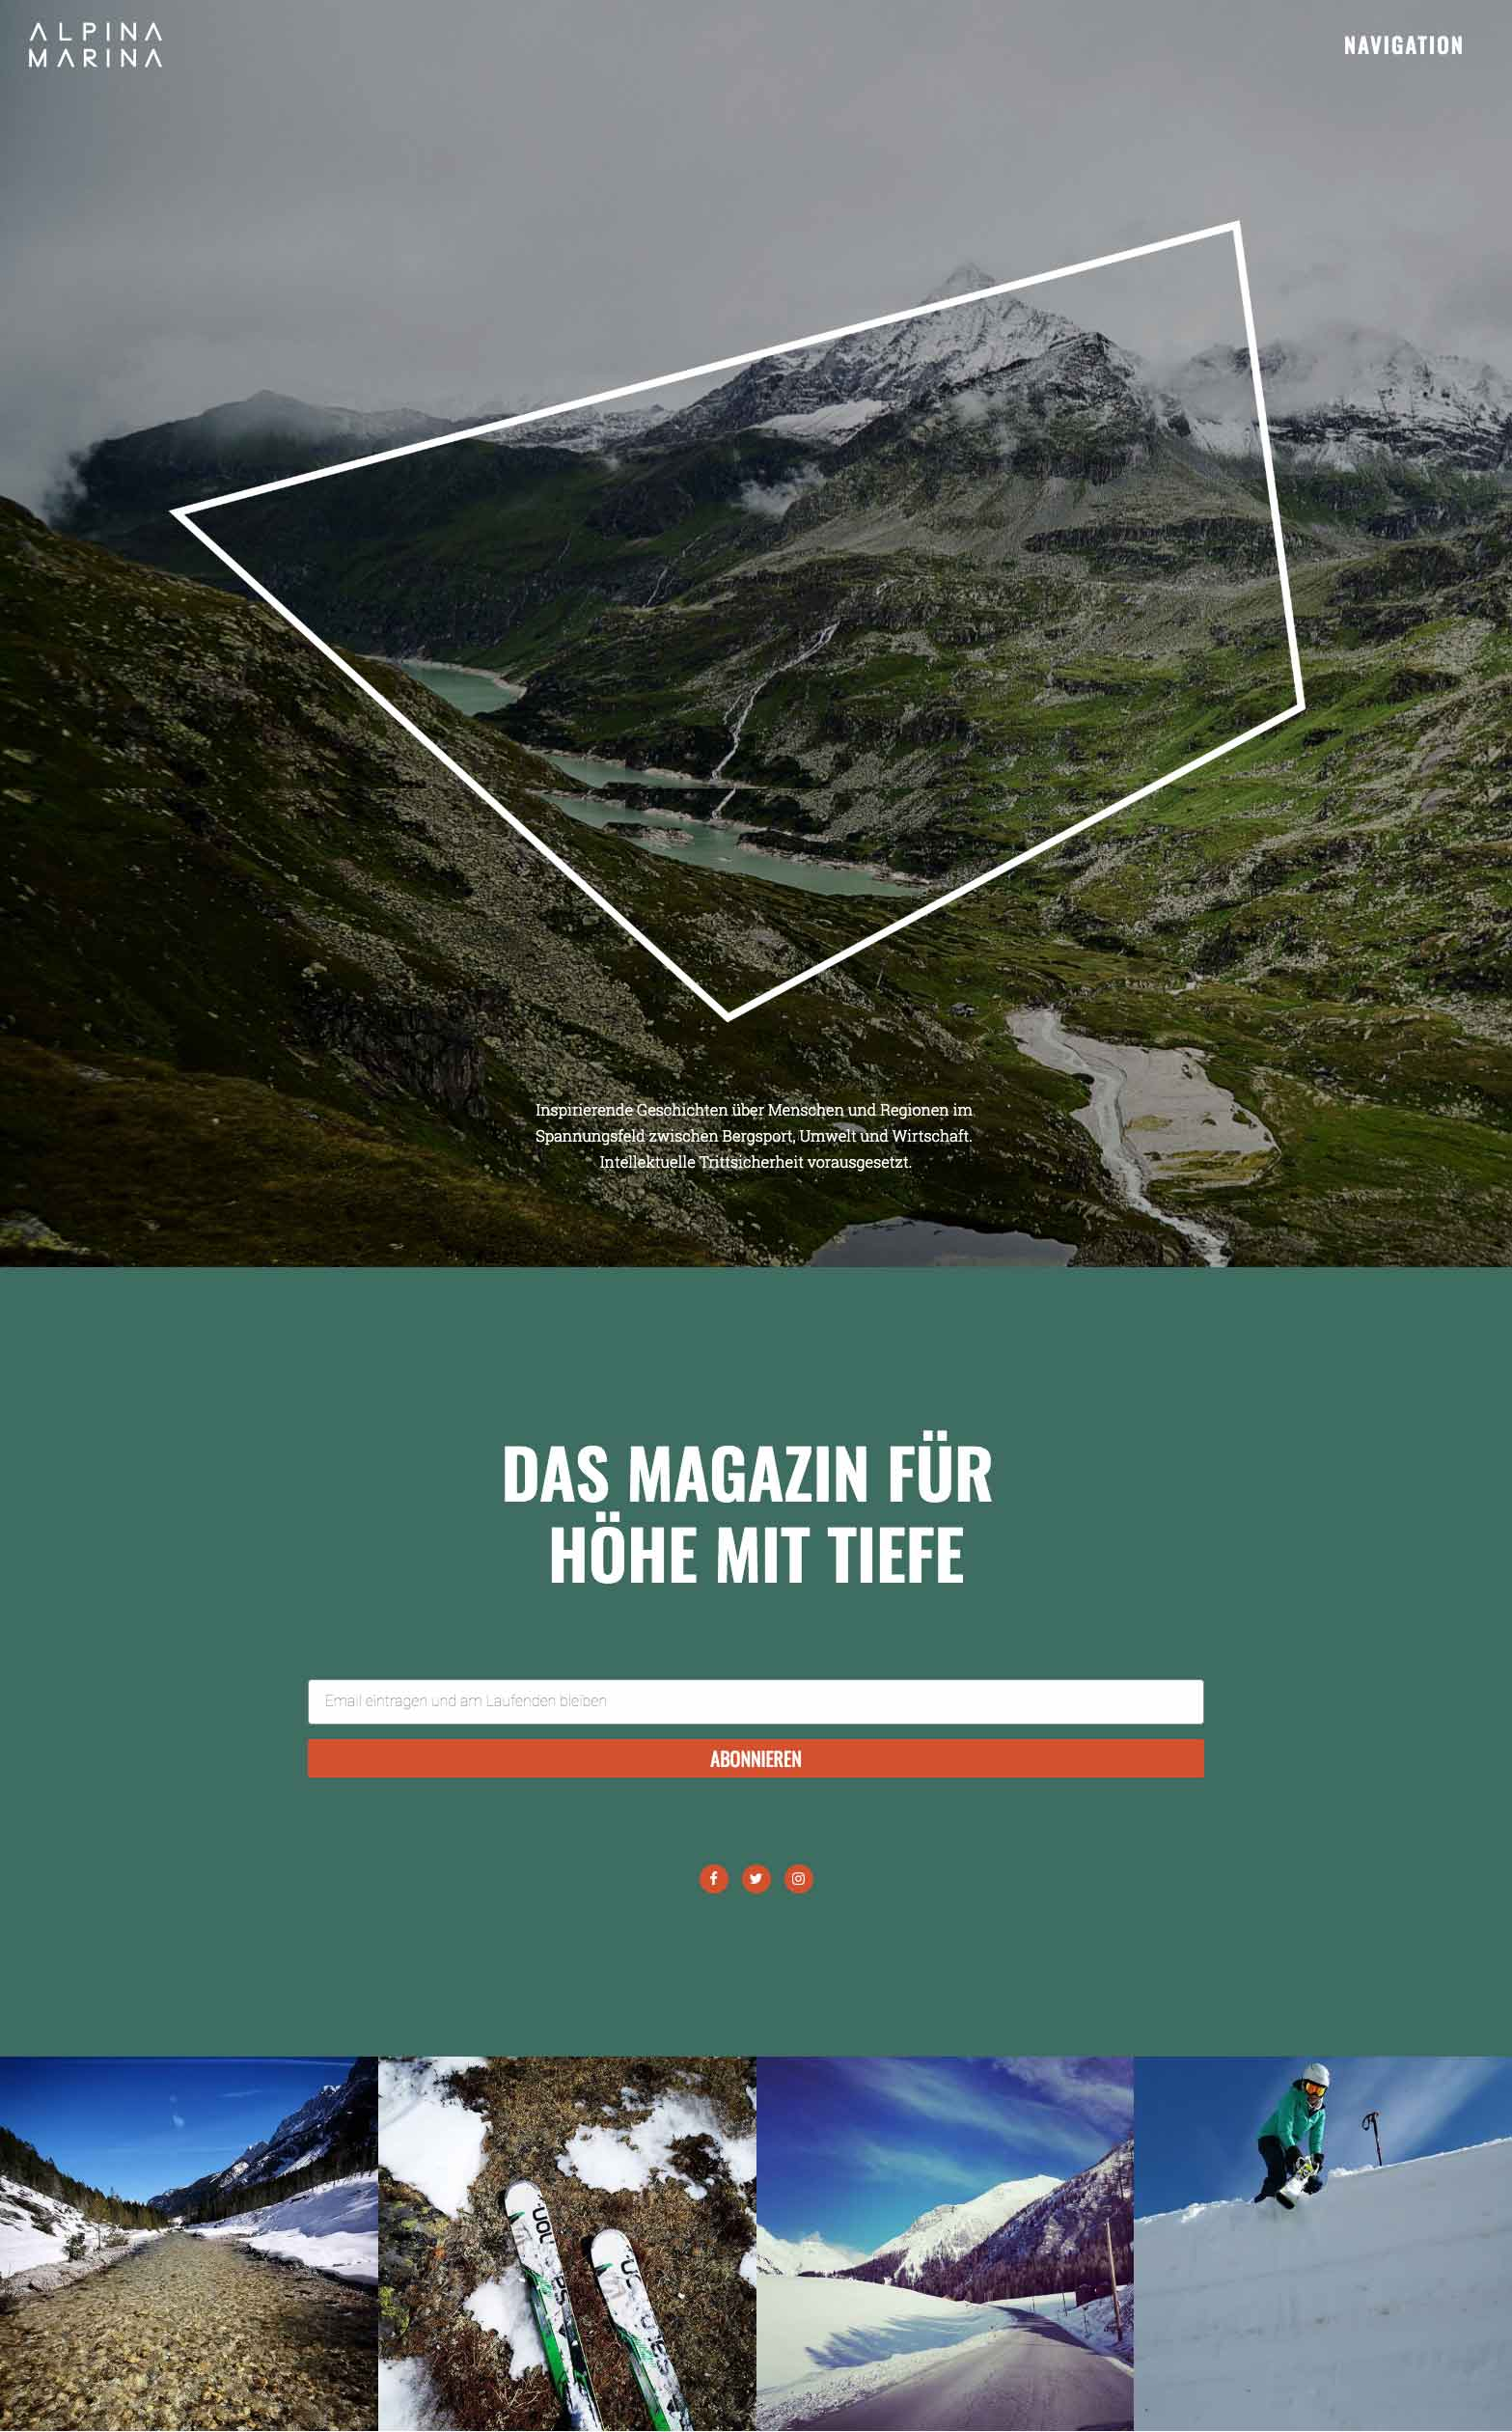 alpinamarina_website